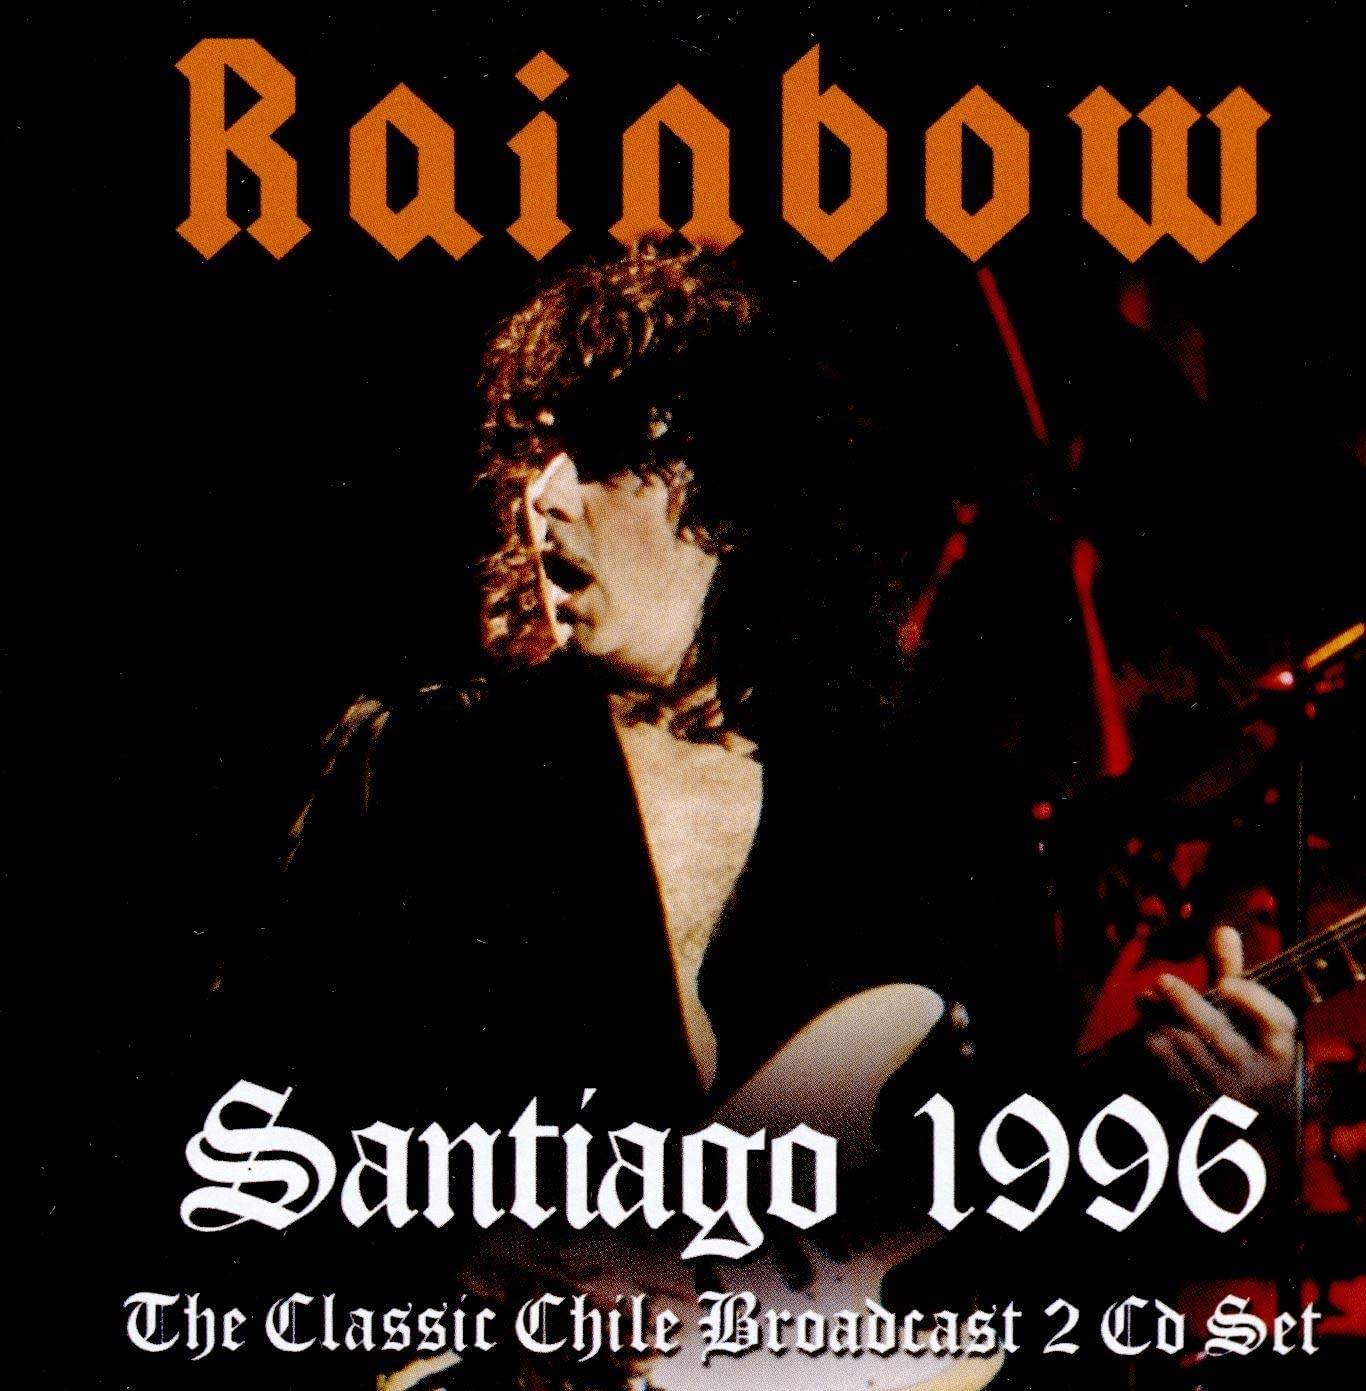 Santiago 1996 (2CD)